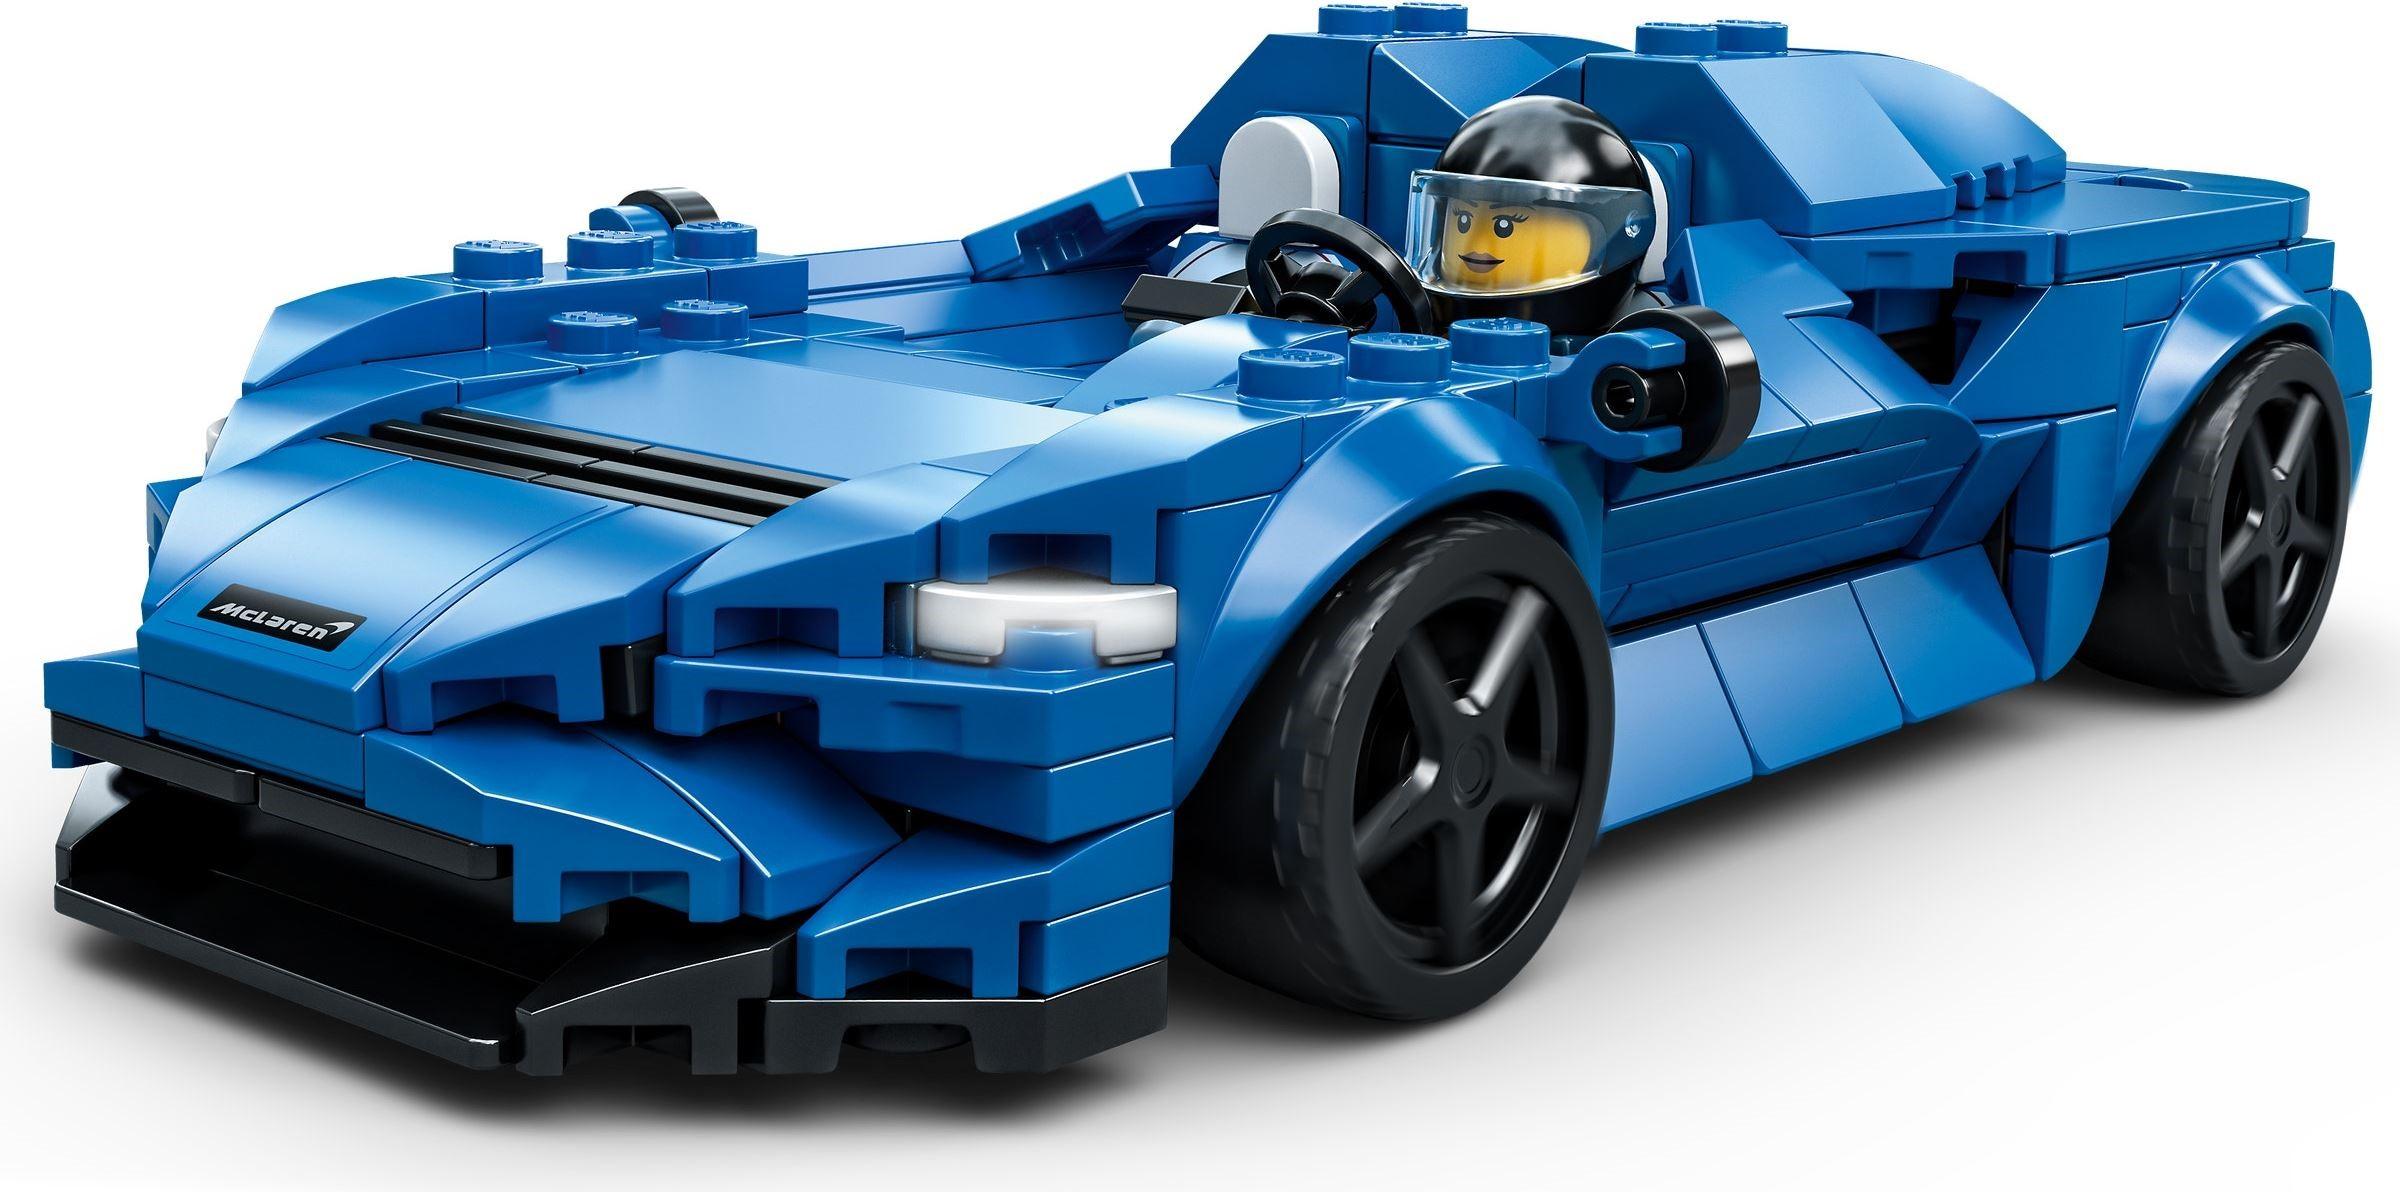 76902 LEGO Speed Champions McLaren Elva - Đồ chơi LEGO siêu xe